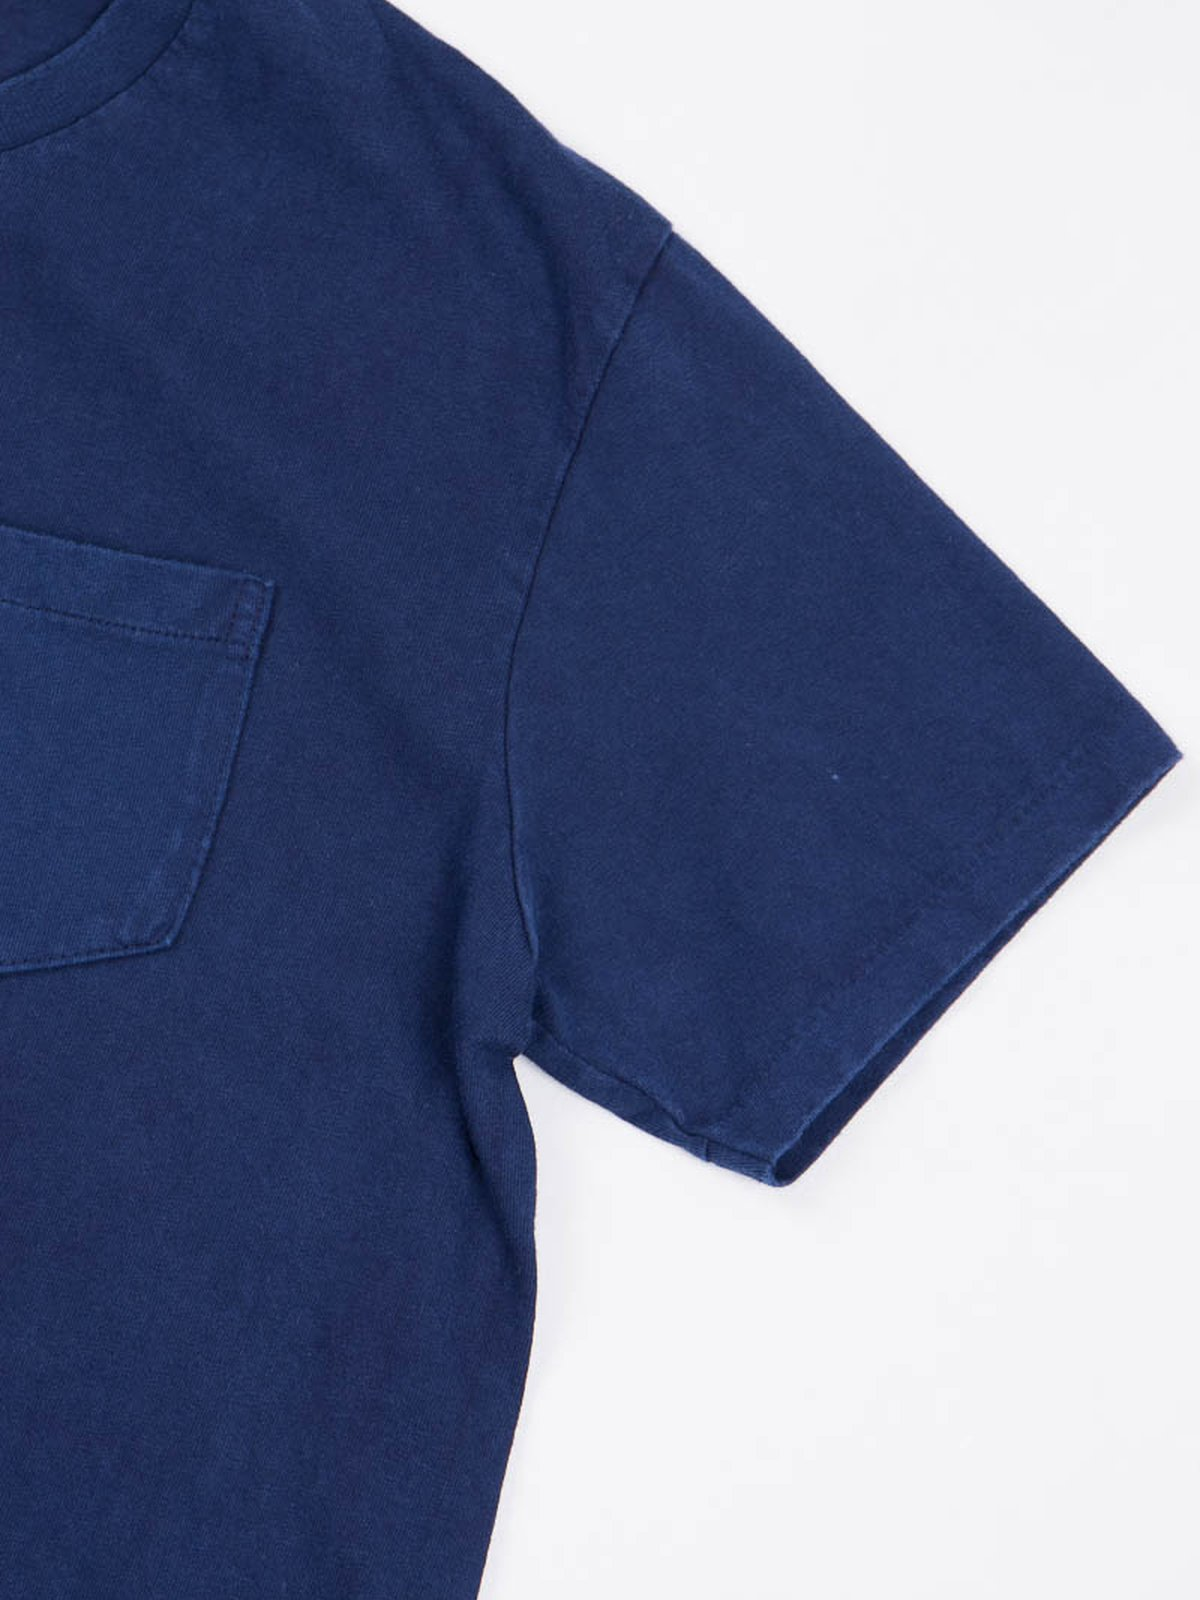 Blue Indigo 1–Pac Pocket Tee - Image 4